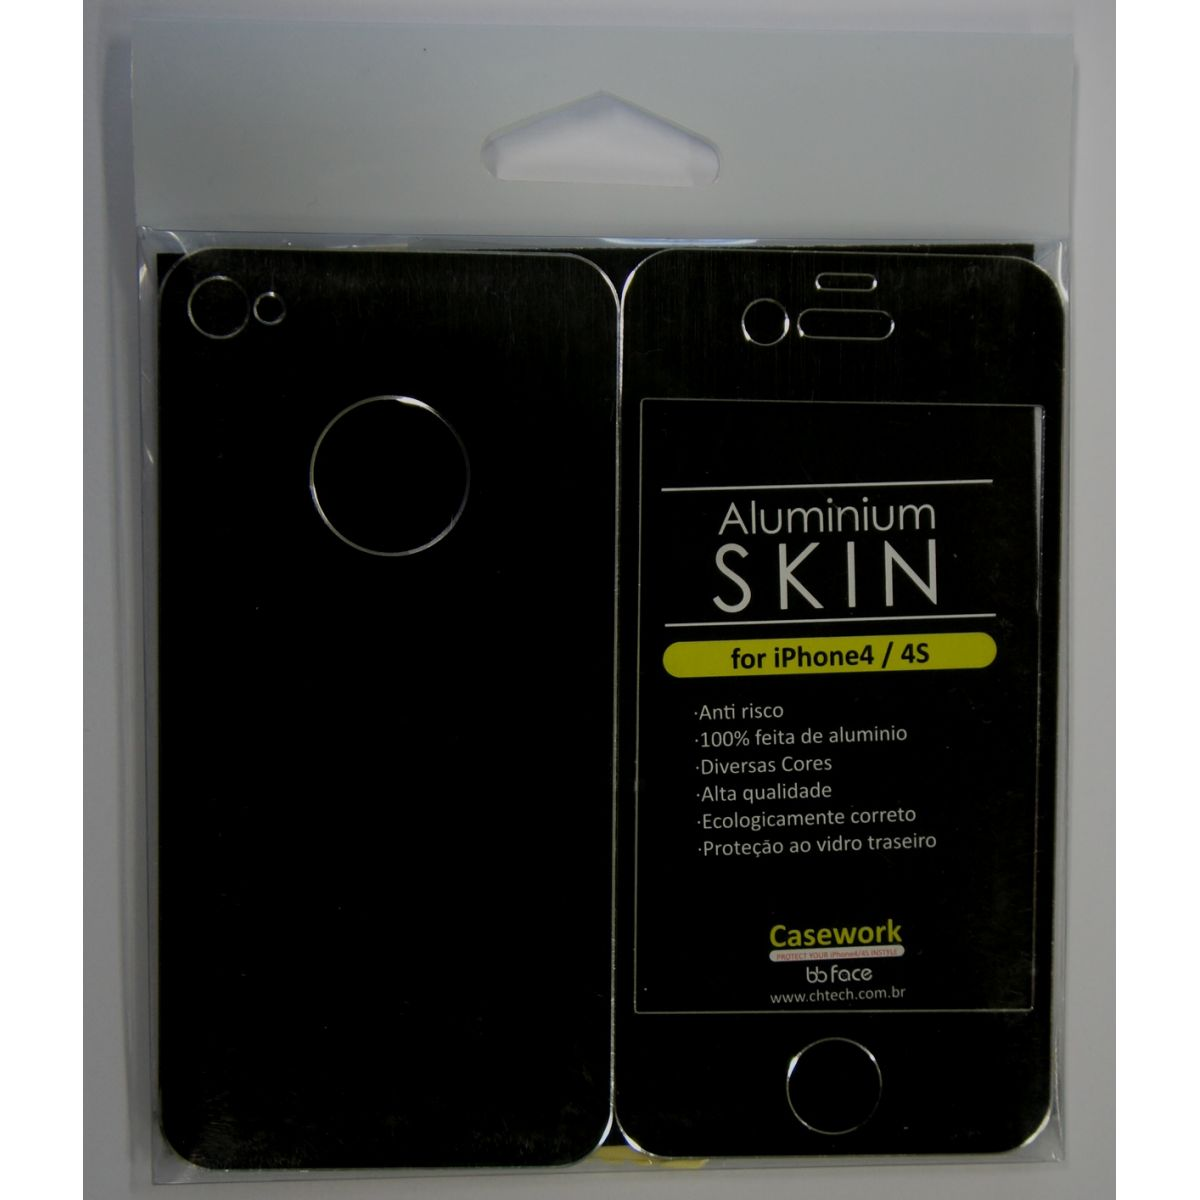 PACK Compre 7 Capas Pague 3 - Capa iphone 4 / 4S Skin preto